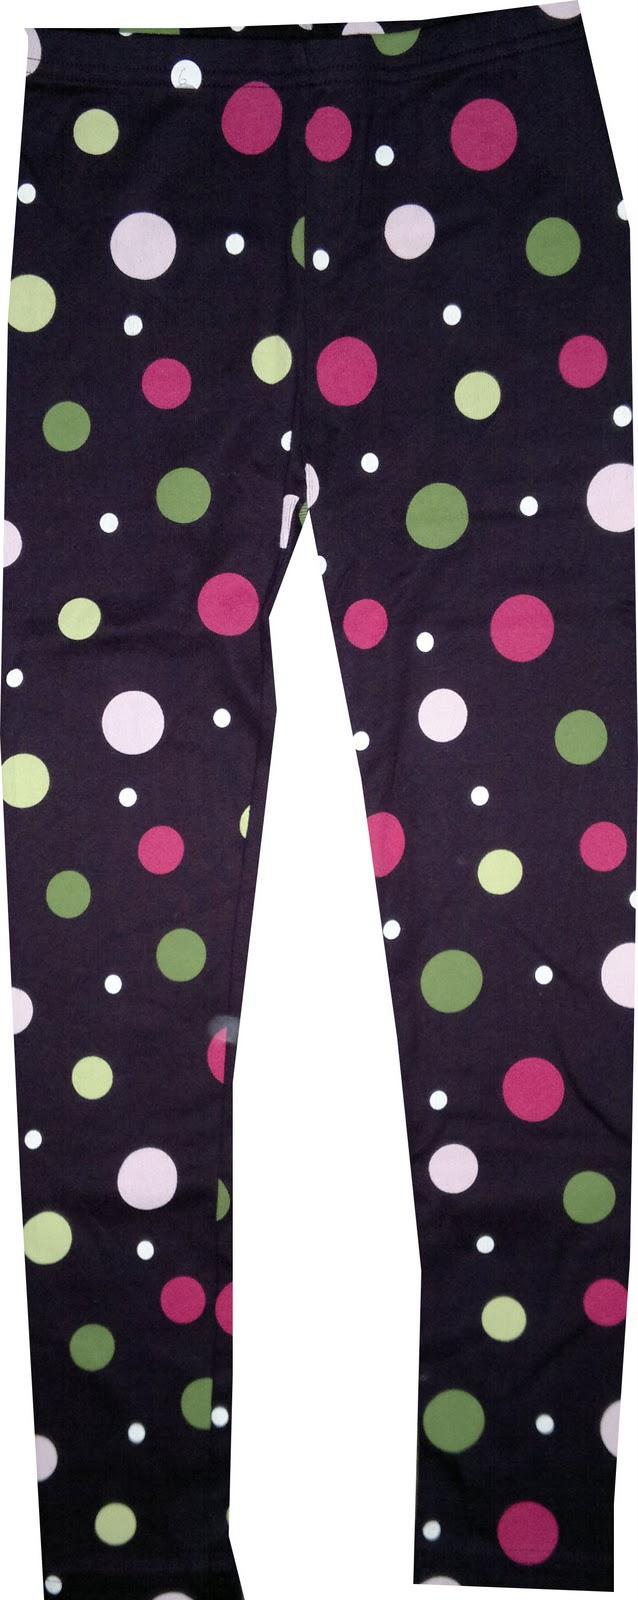 oshkosh single muslim girls Shop oshkosh girl baby set with short sleeve at lazada muslim wear girls' clothing girls' shoes oshkosh girls allover floral print front pocket overalls.